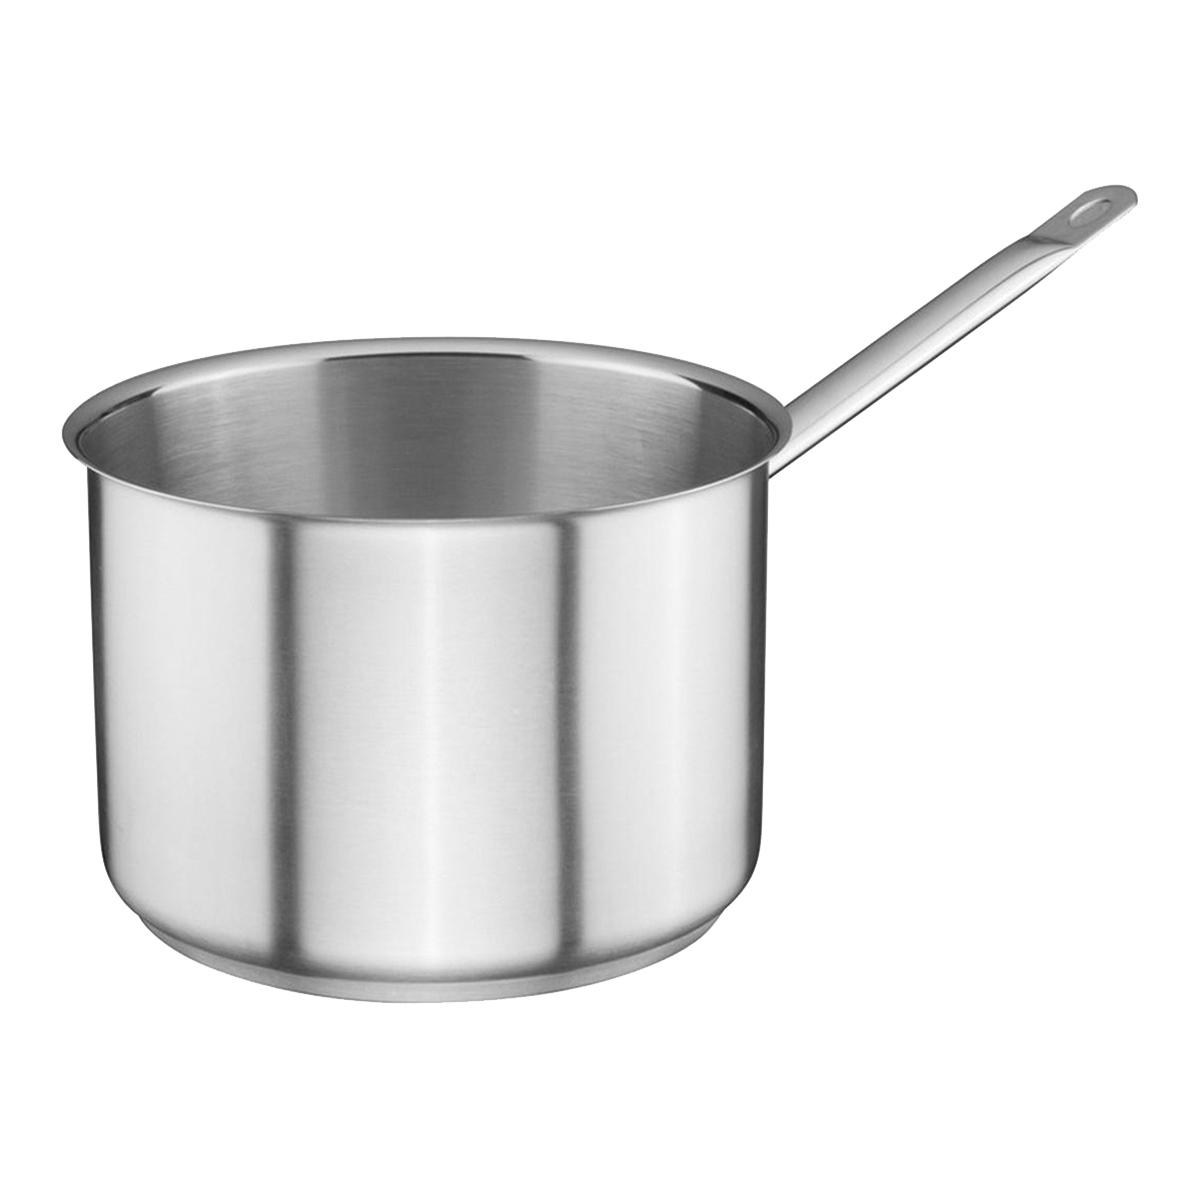 Image of   H. W. Larsen kasserolle - Oztiryakile - 2 liter